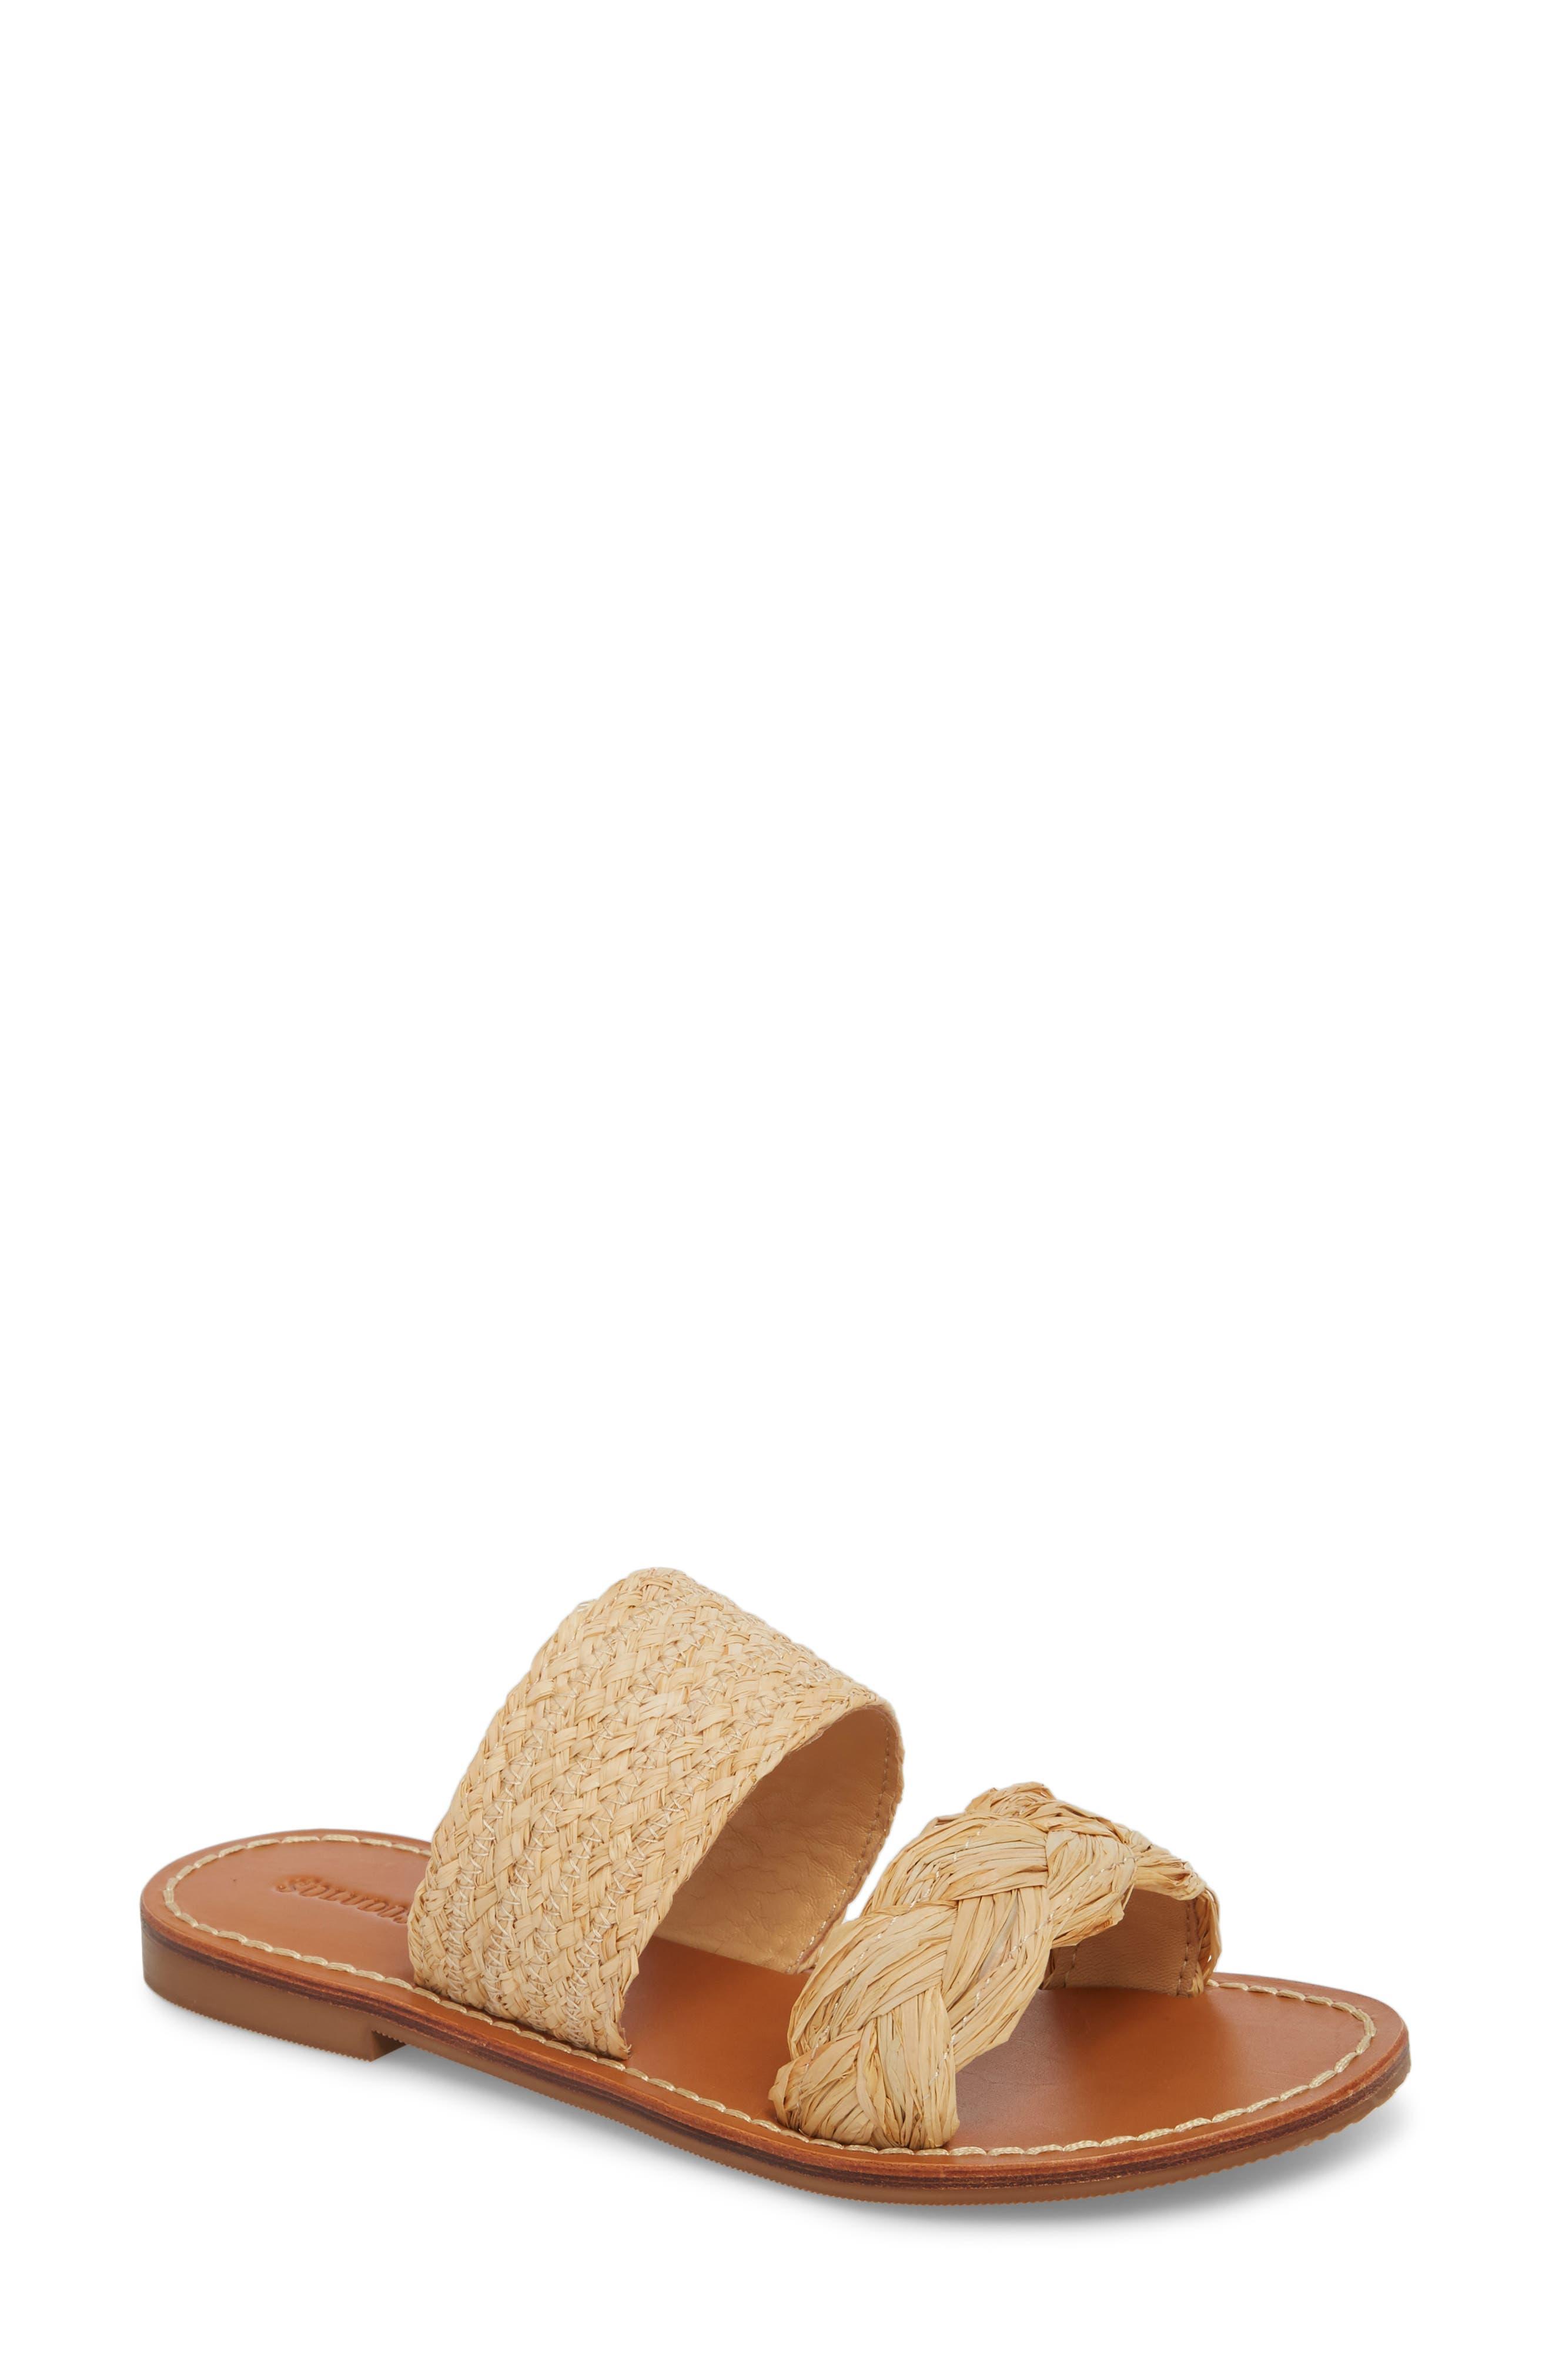 Braided Slide Sandal,                             Main thumbnail 1, color,                             250